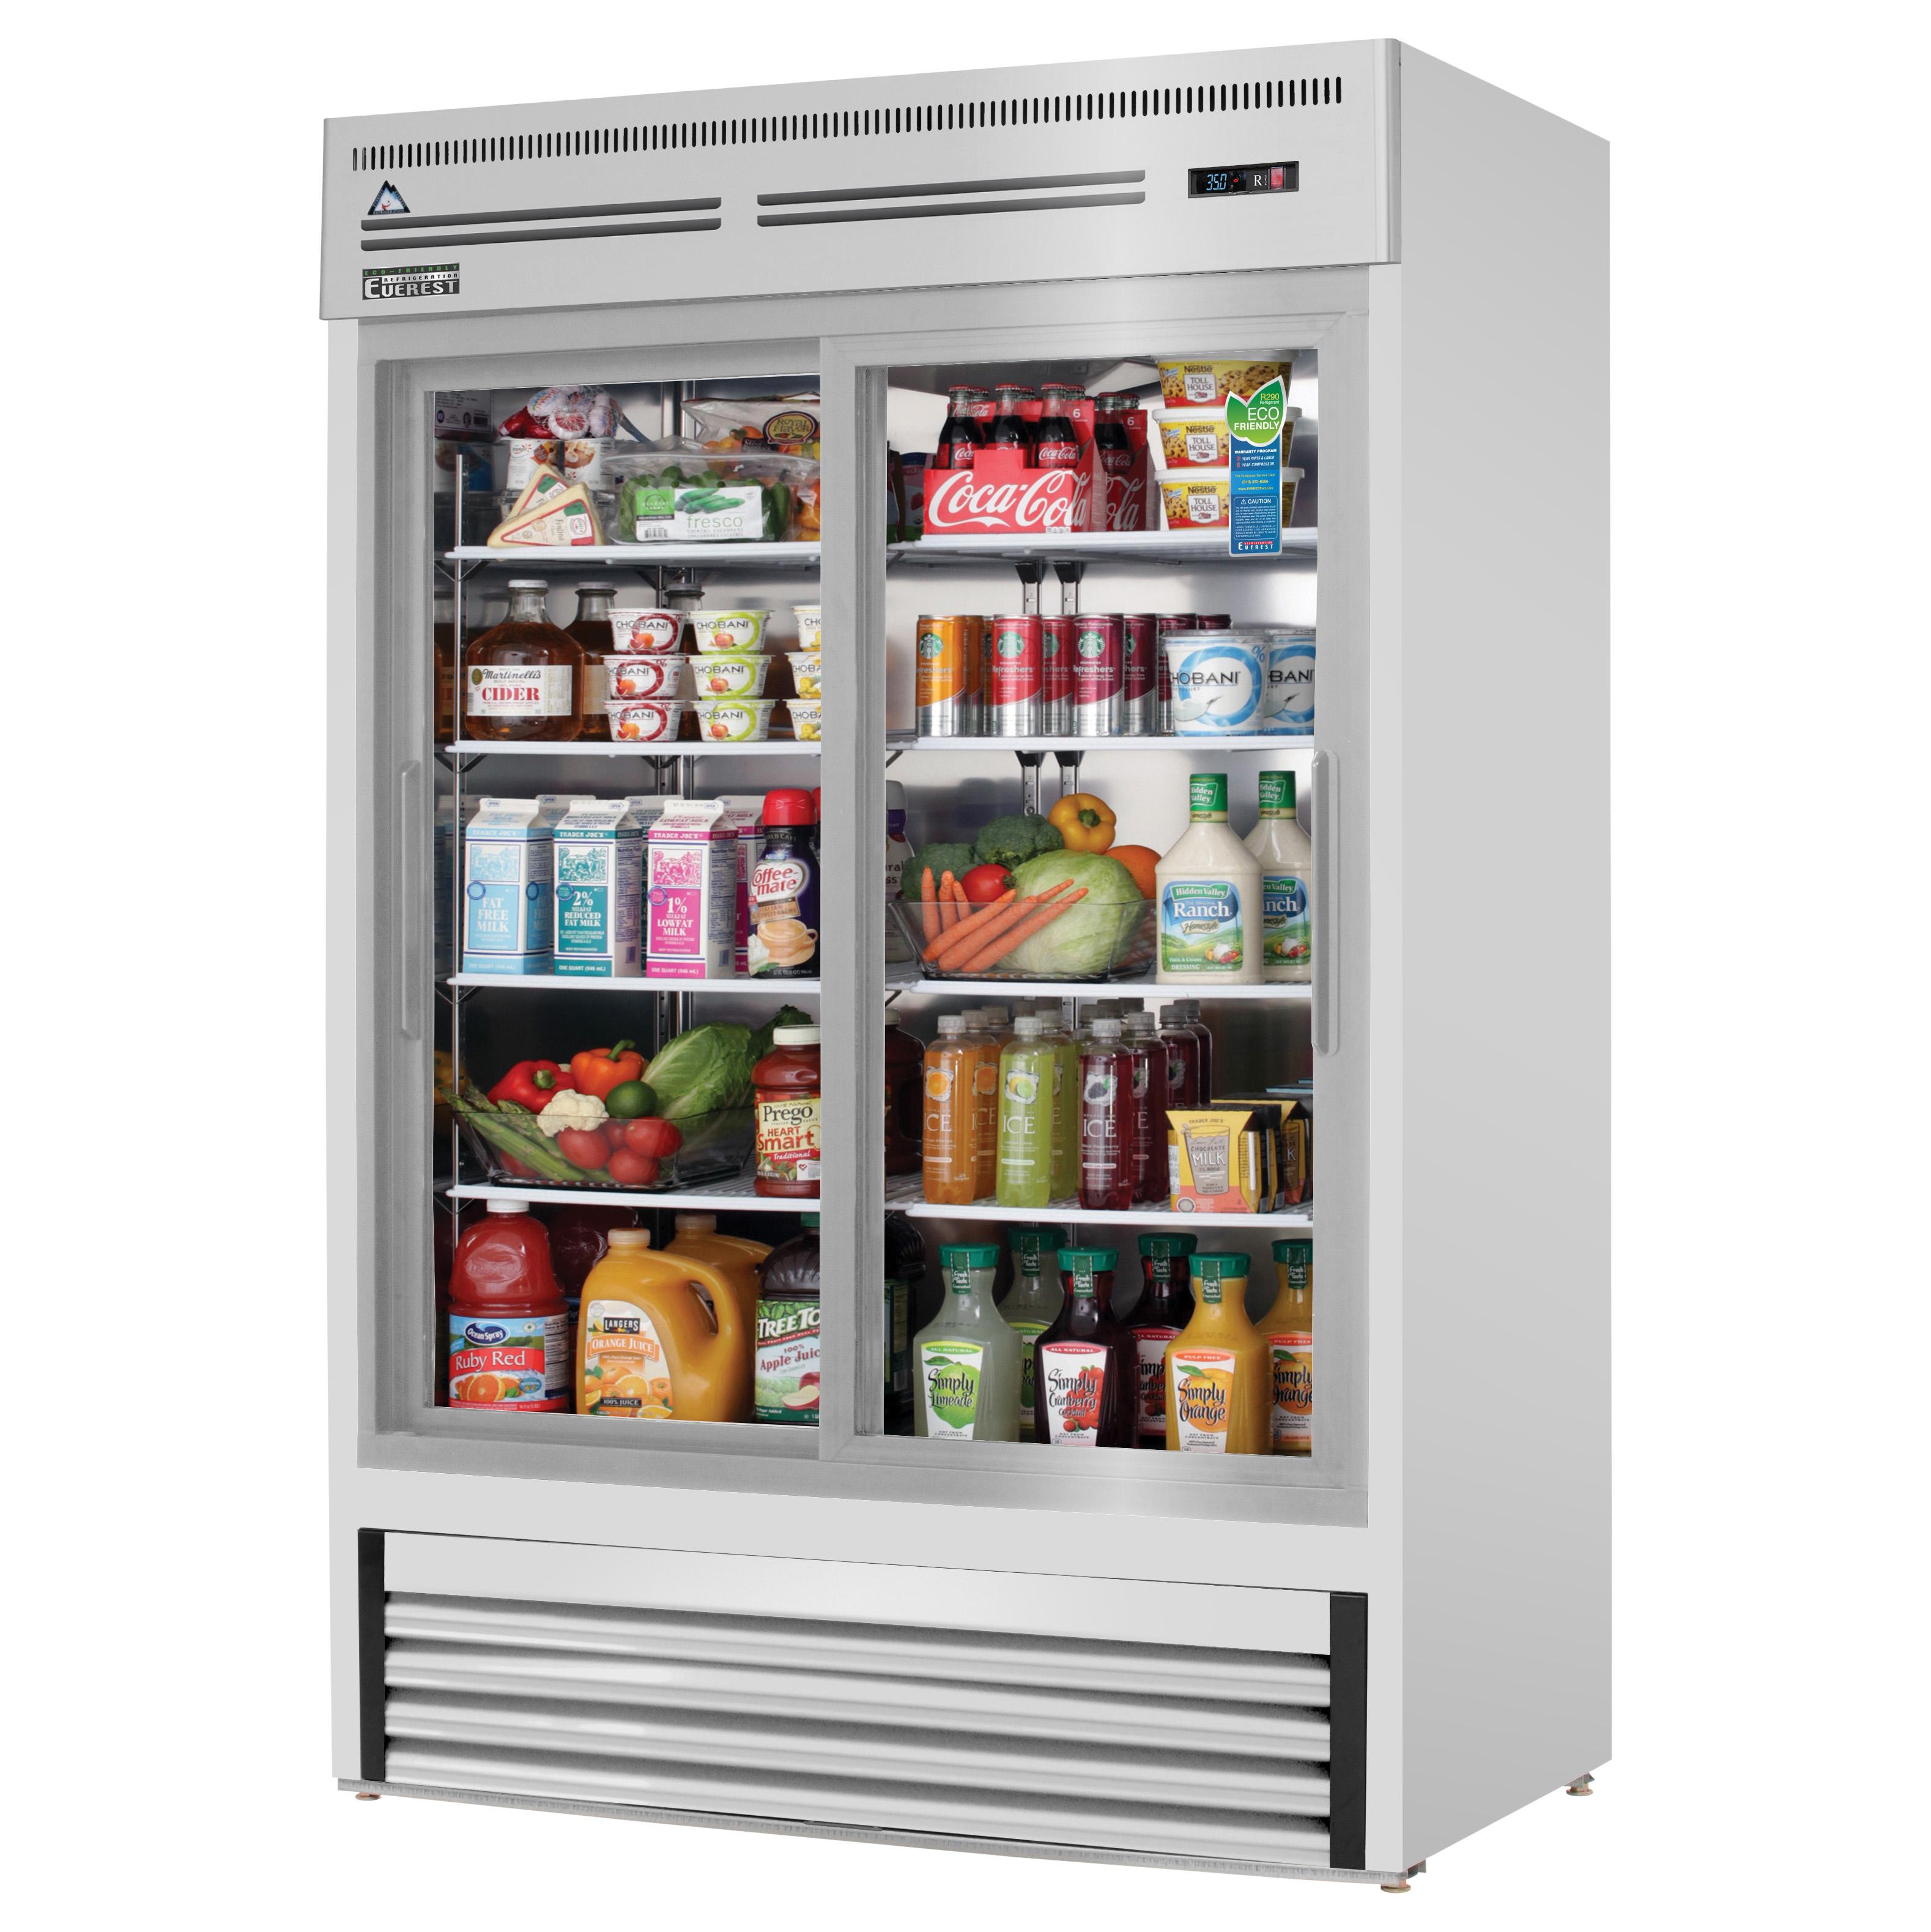 Everest Refrigeration EMGR48-SS refrigerator, merchandiser